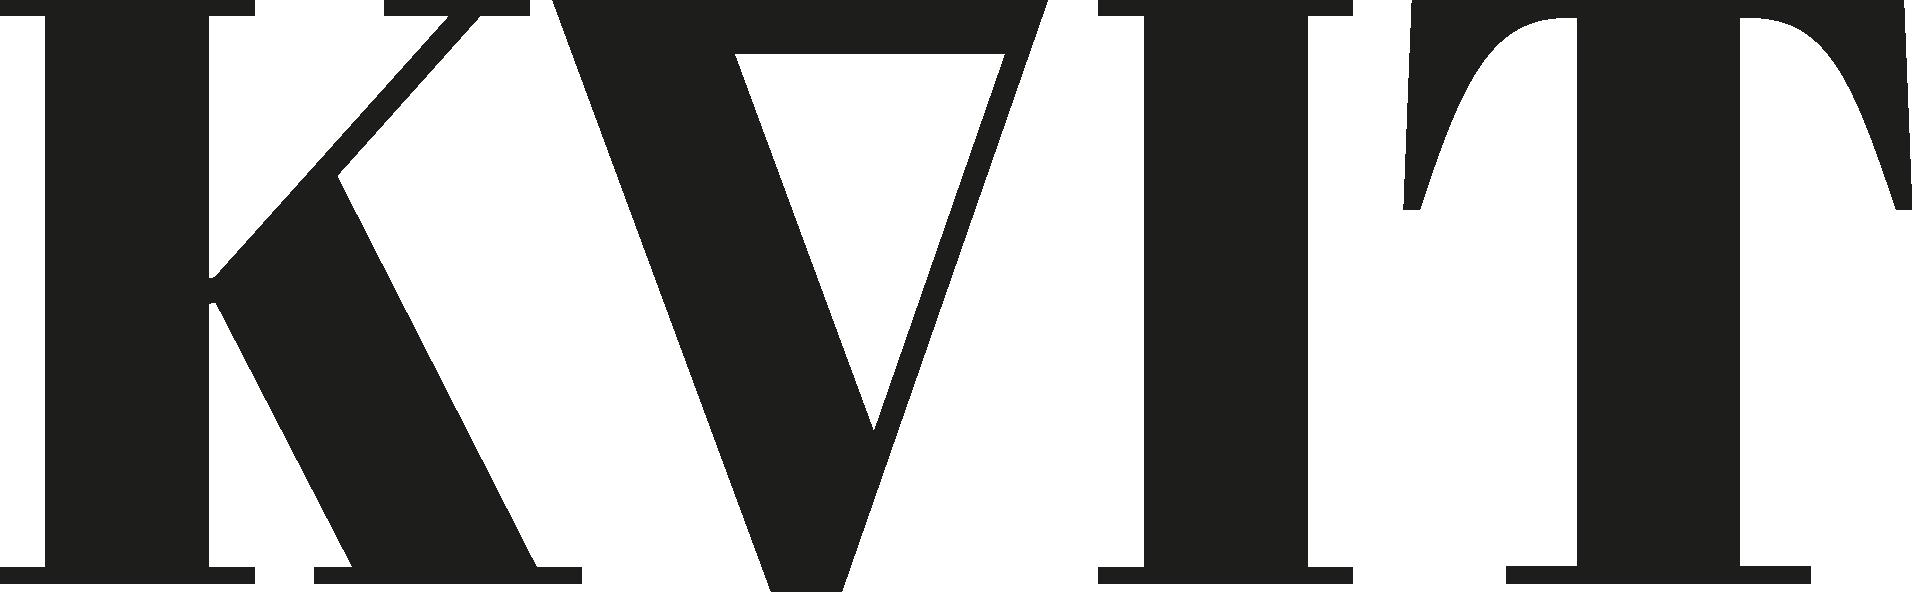 Logos Kvit